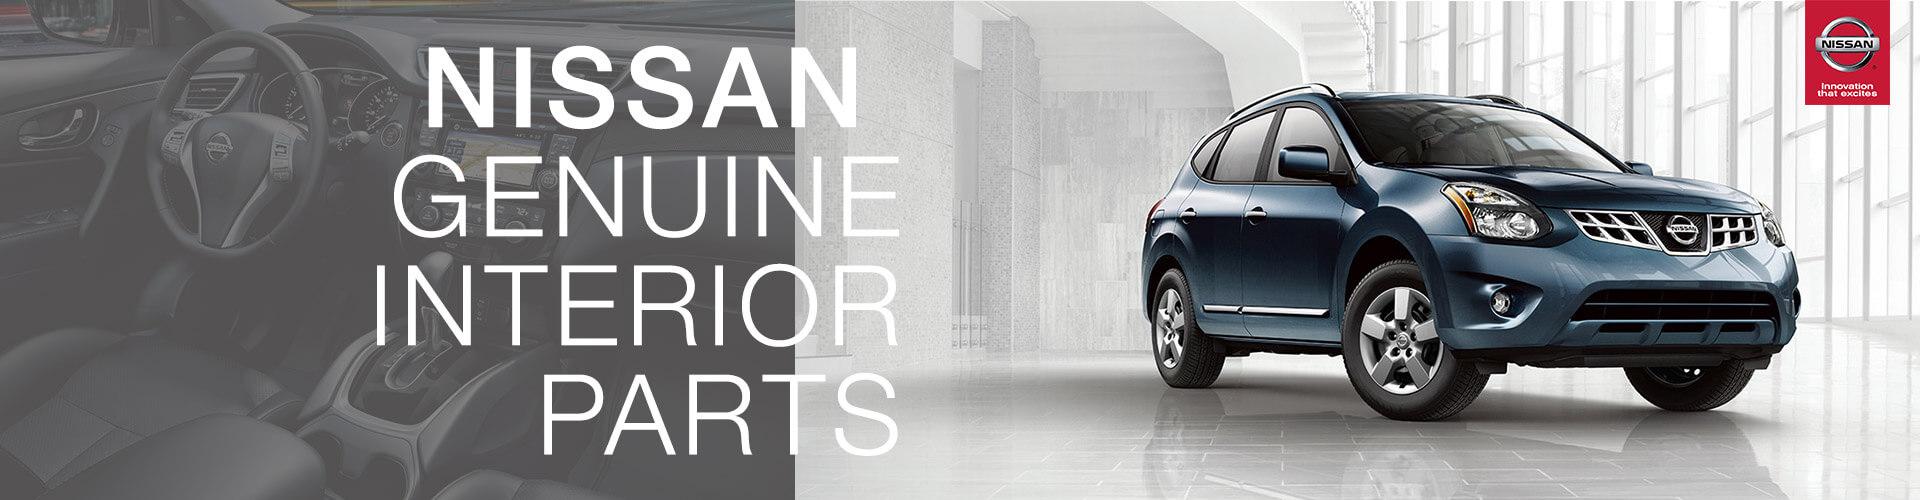 Nissan Interior OEM Parts